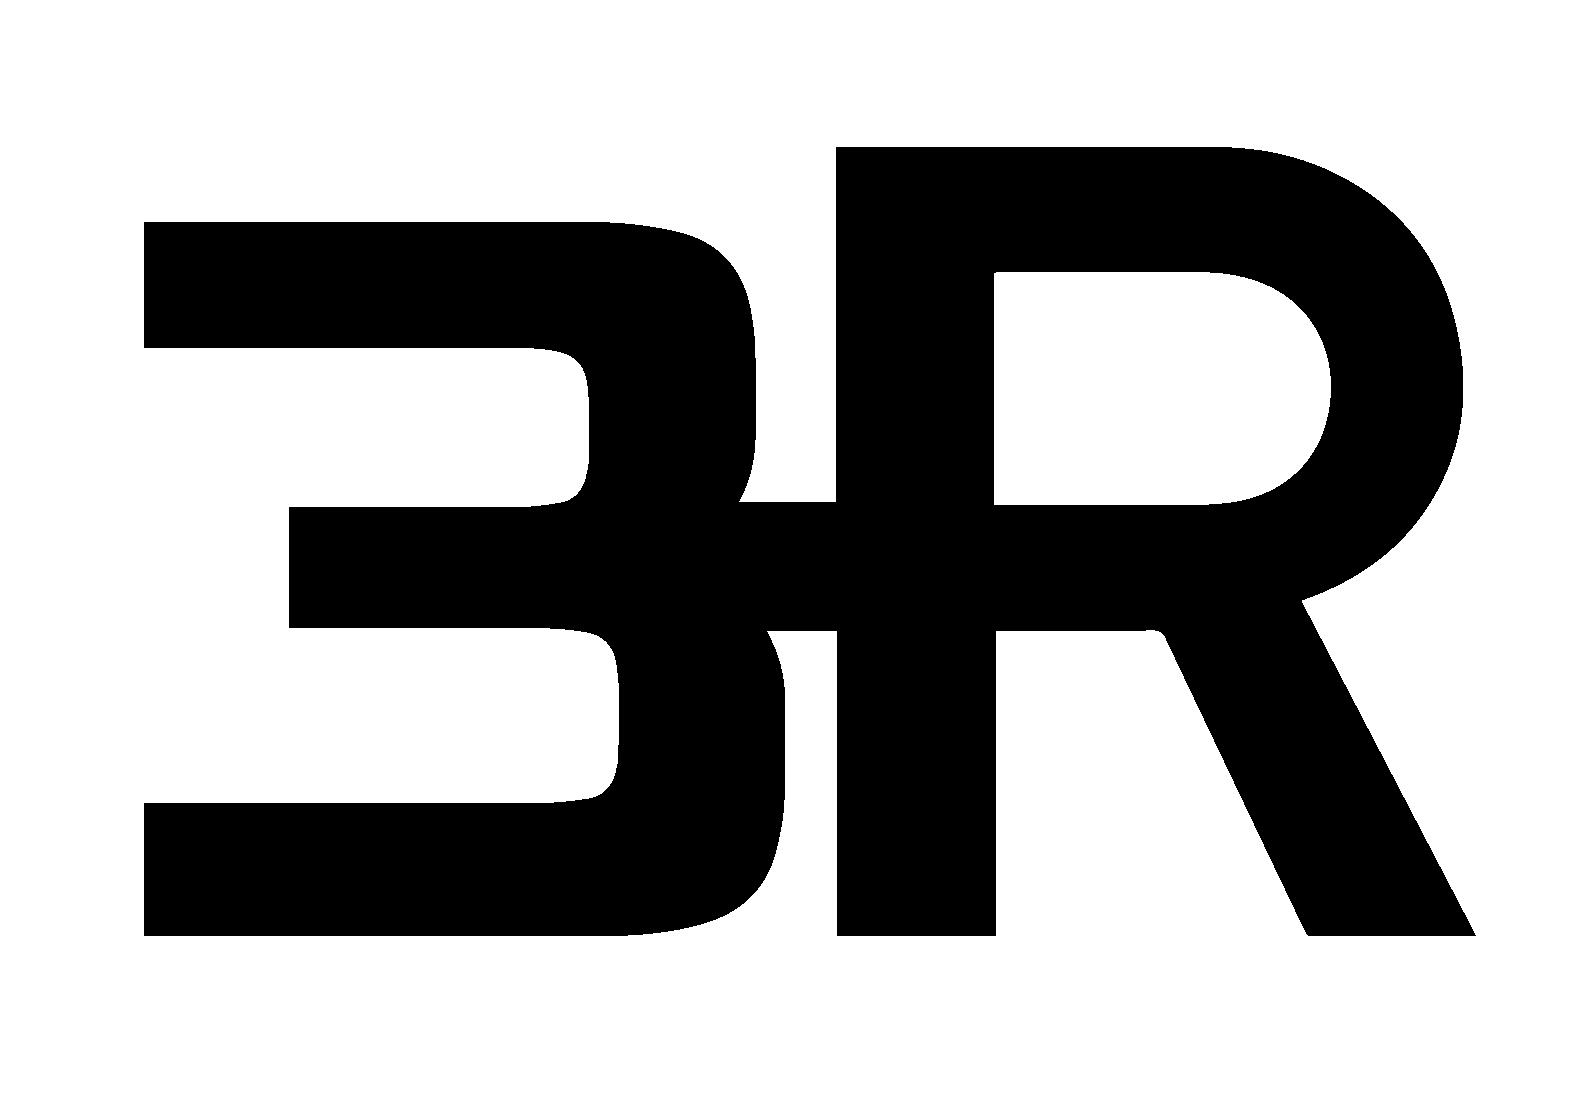 3R_Logo_Black